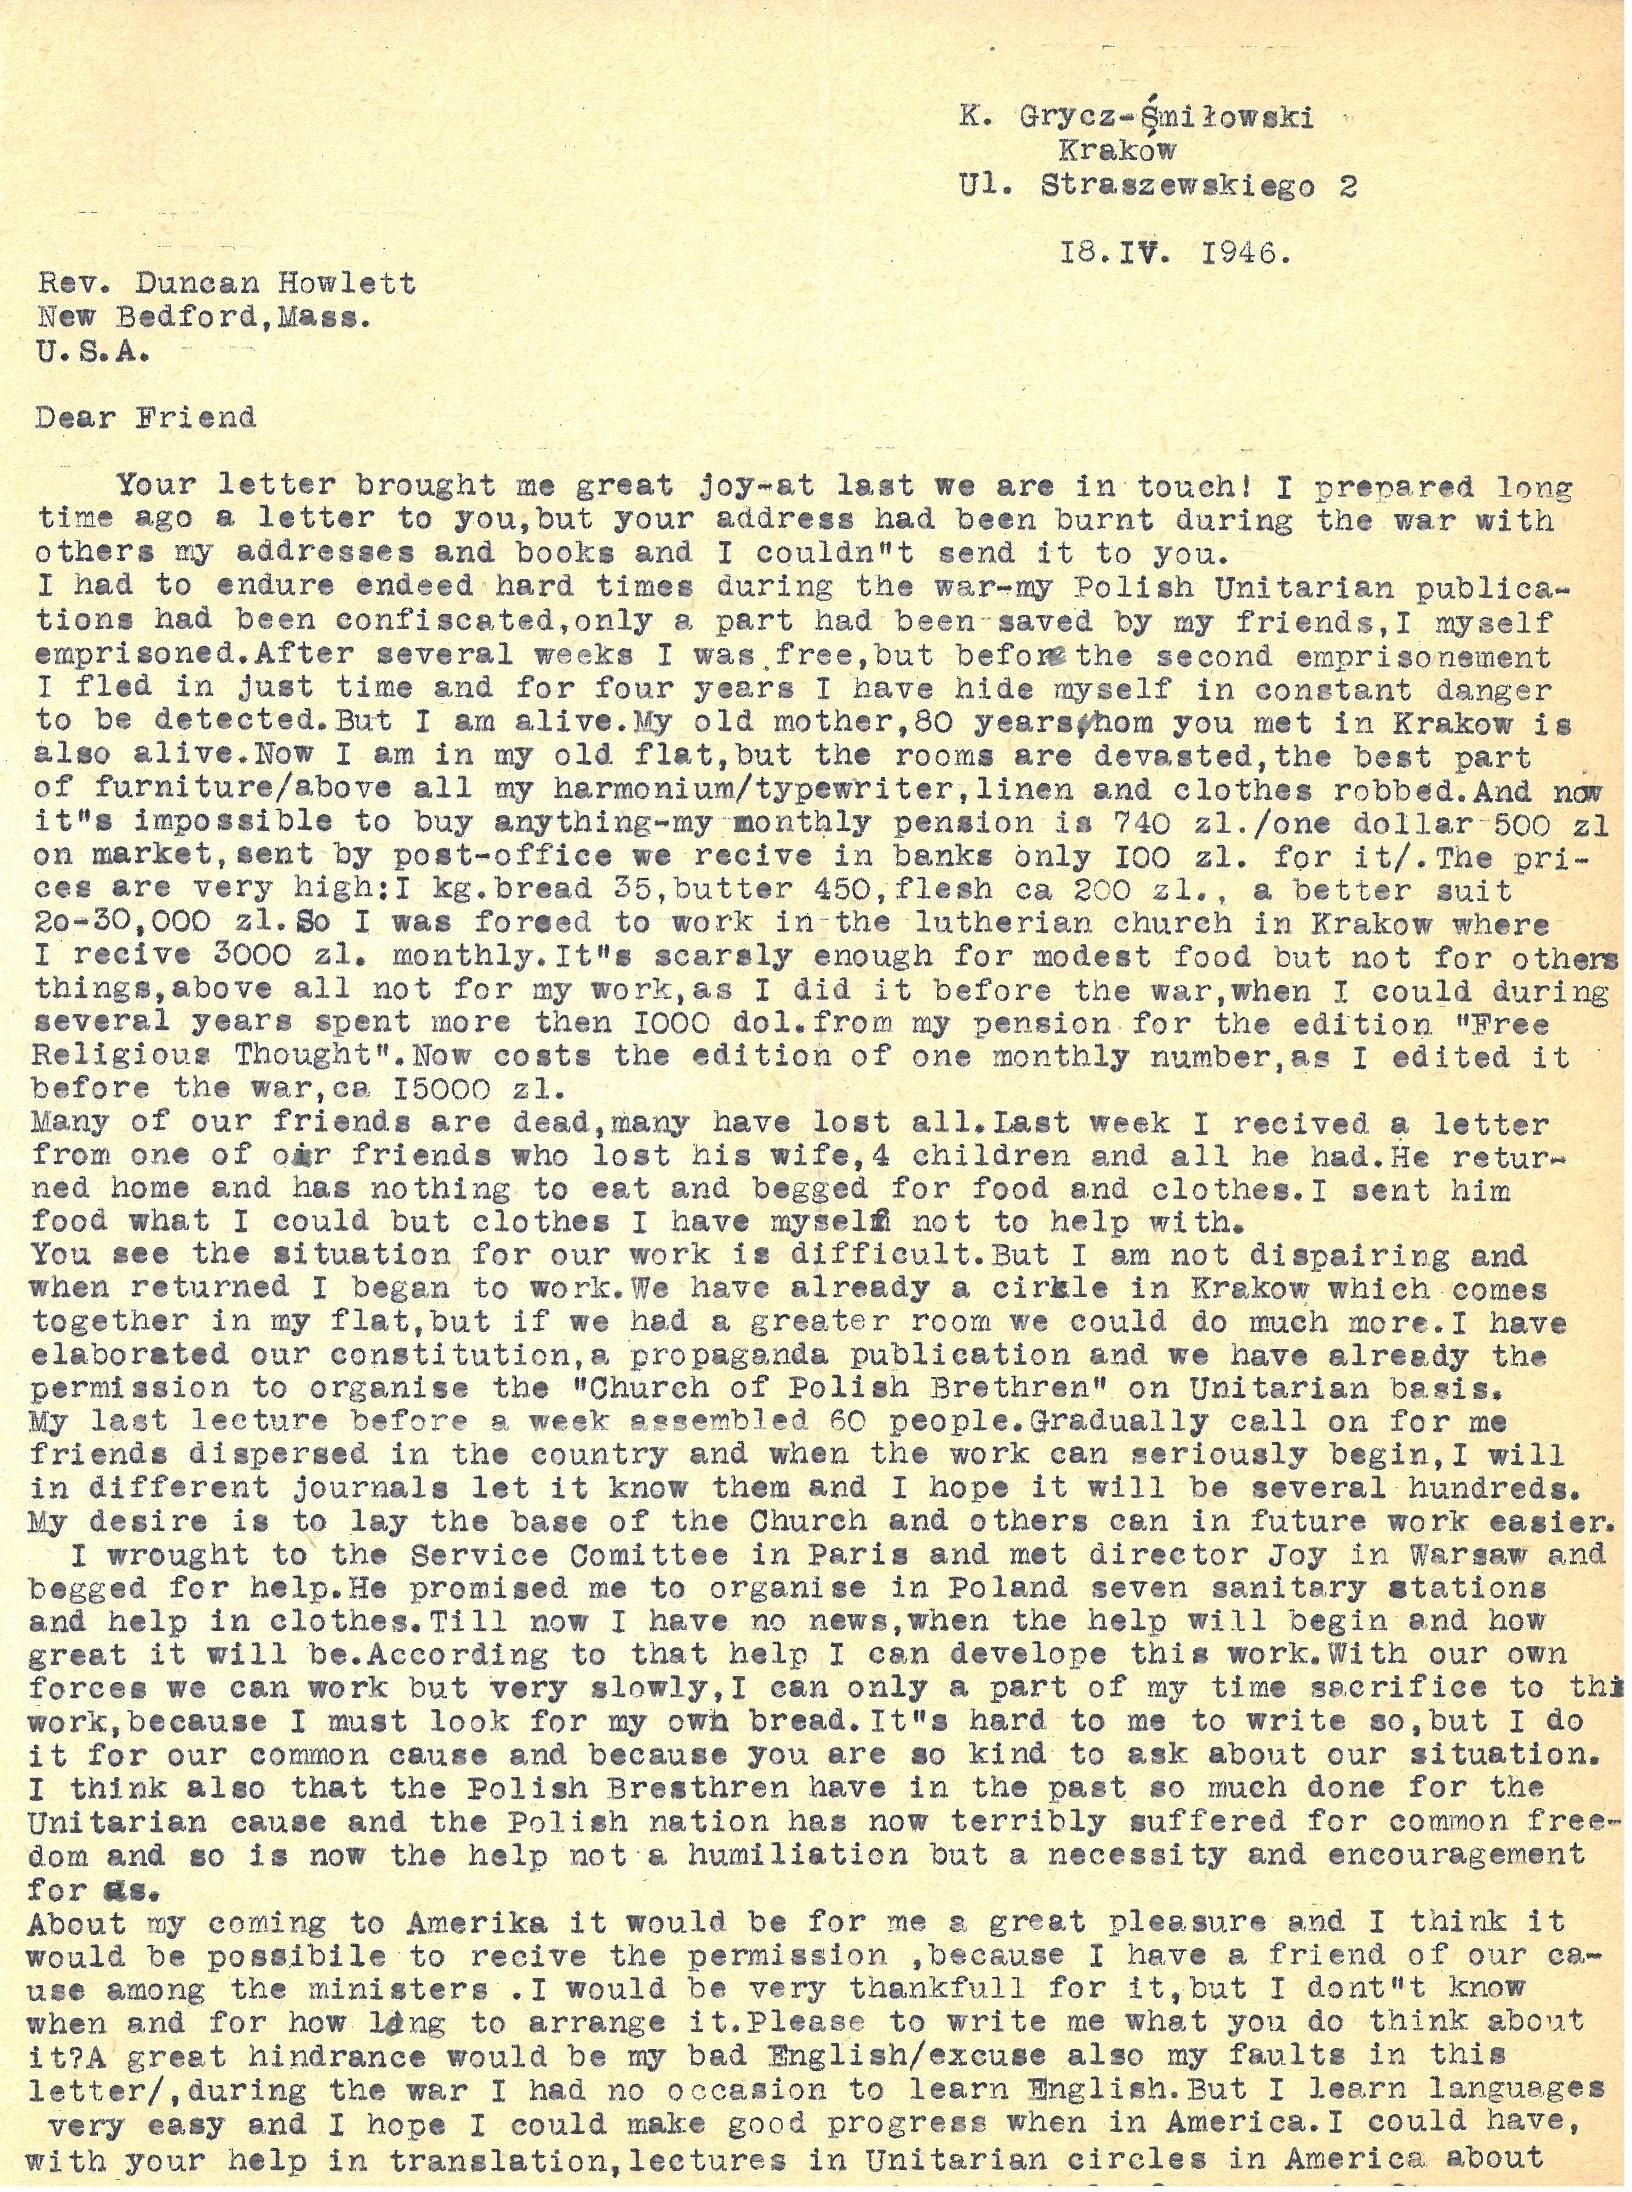 Coll. 2993 Duncan Howlett letter from Karol Grycz-Smilowski